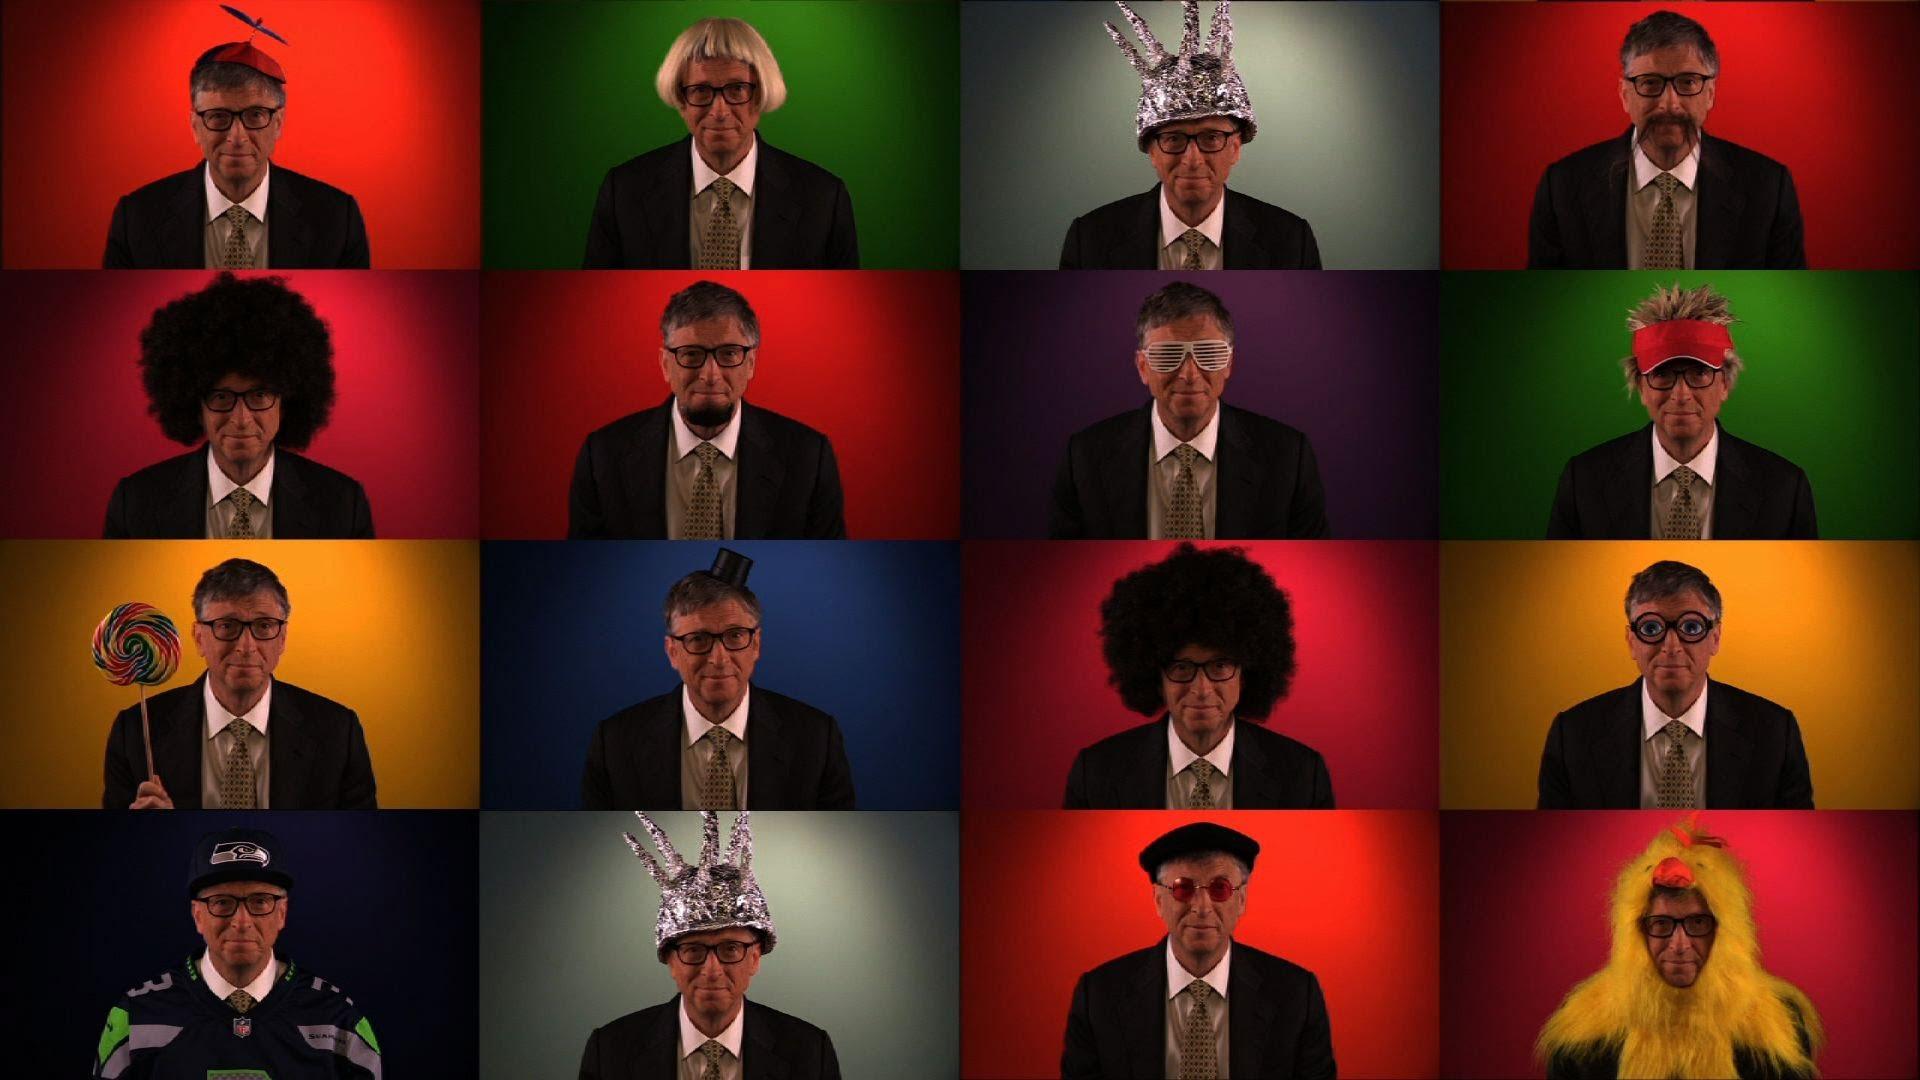 「比爾蓋茲kuso宣傳慈善網站」- Bill Gates' Viral Video: GatesLetter.com